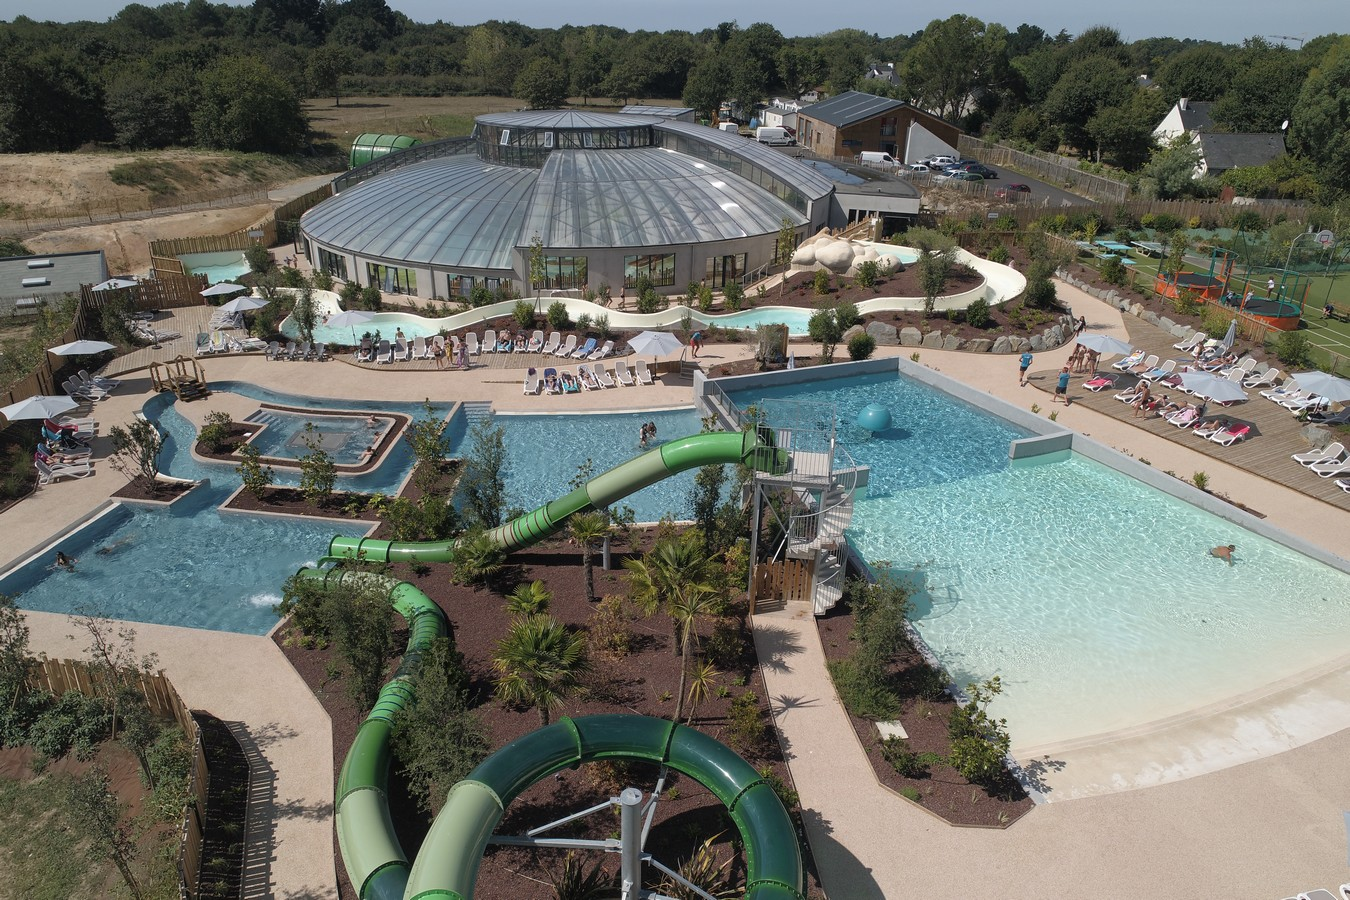 Camping morbihan bretagne avec espace aquatique et piscine - Camping roscoff avec piscine couverte ...